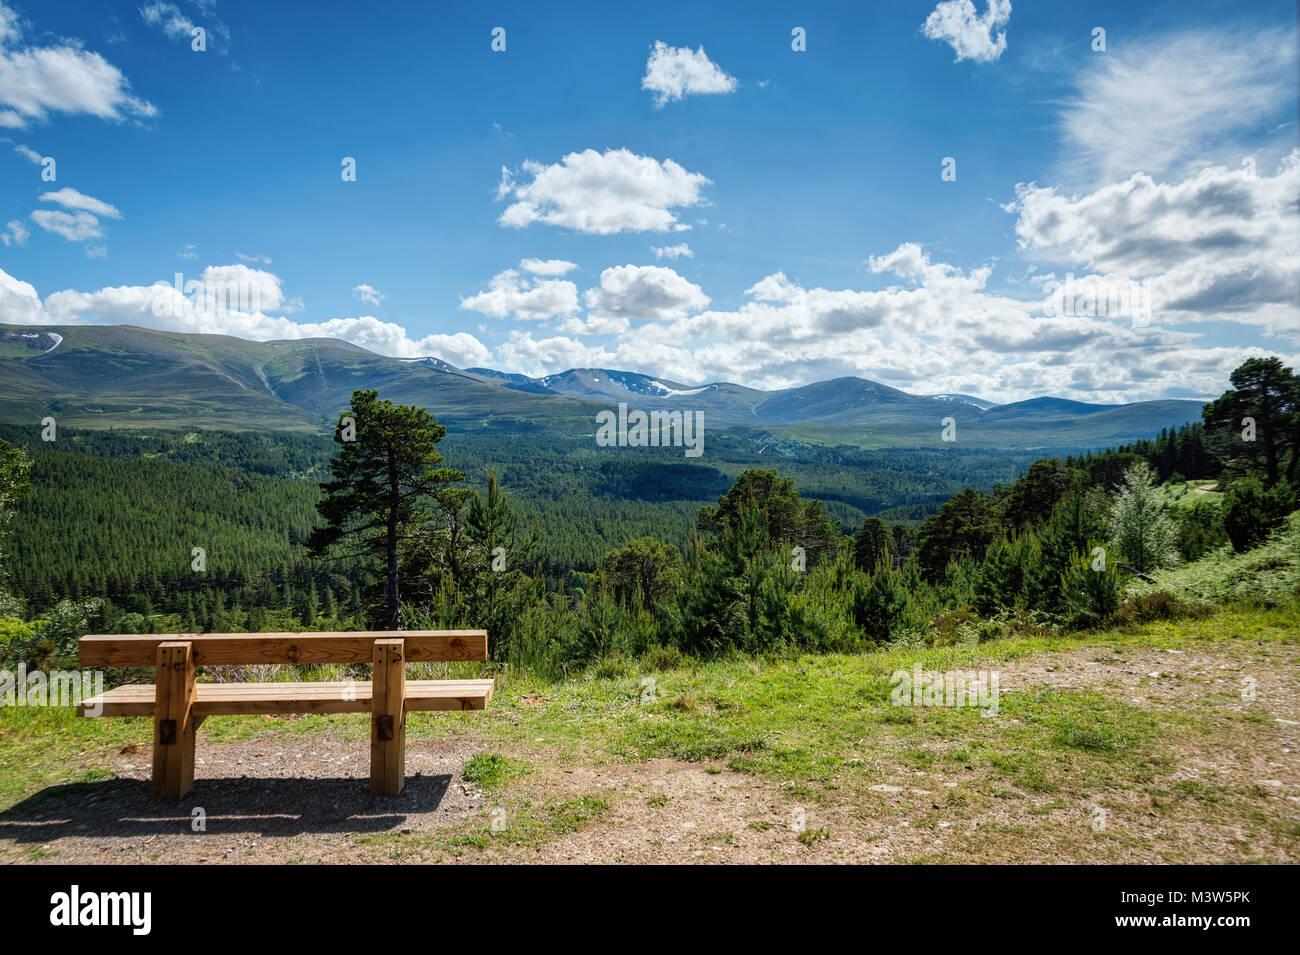 Cairngorms National Park Glenmore Forest Park United Kingdom taken in 2015 Stock Photo